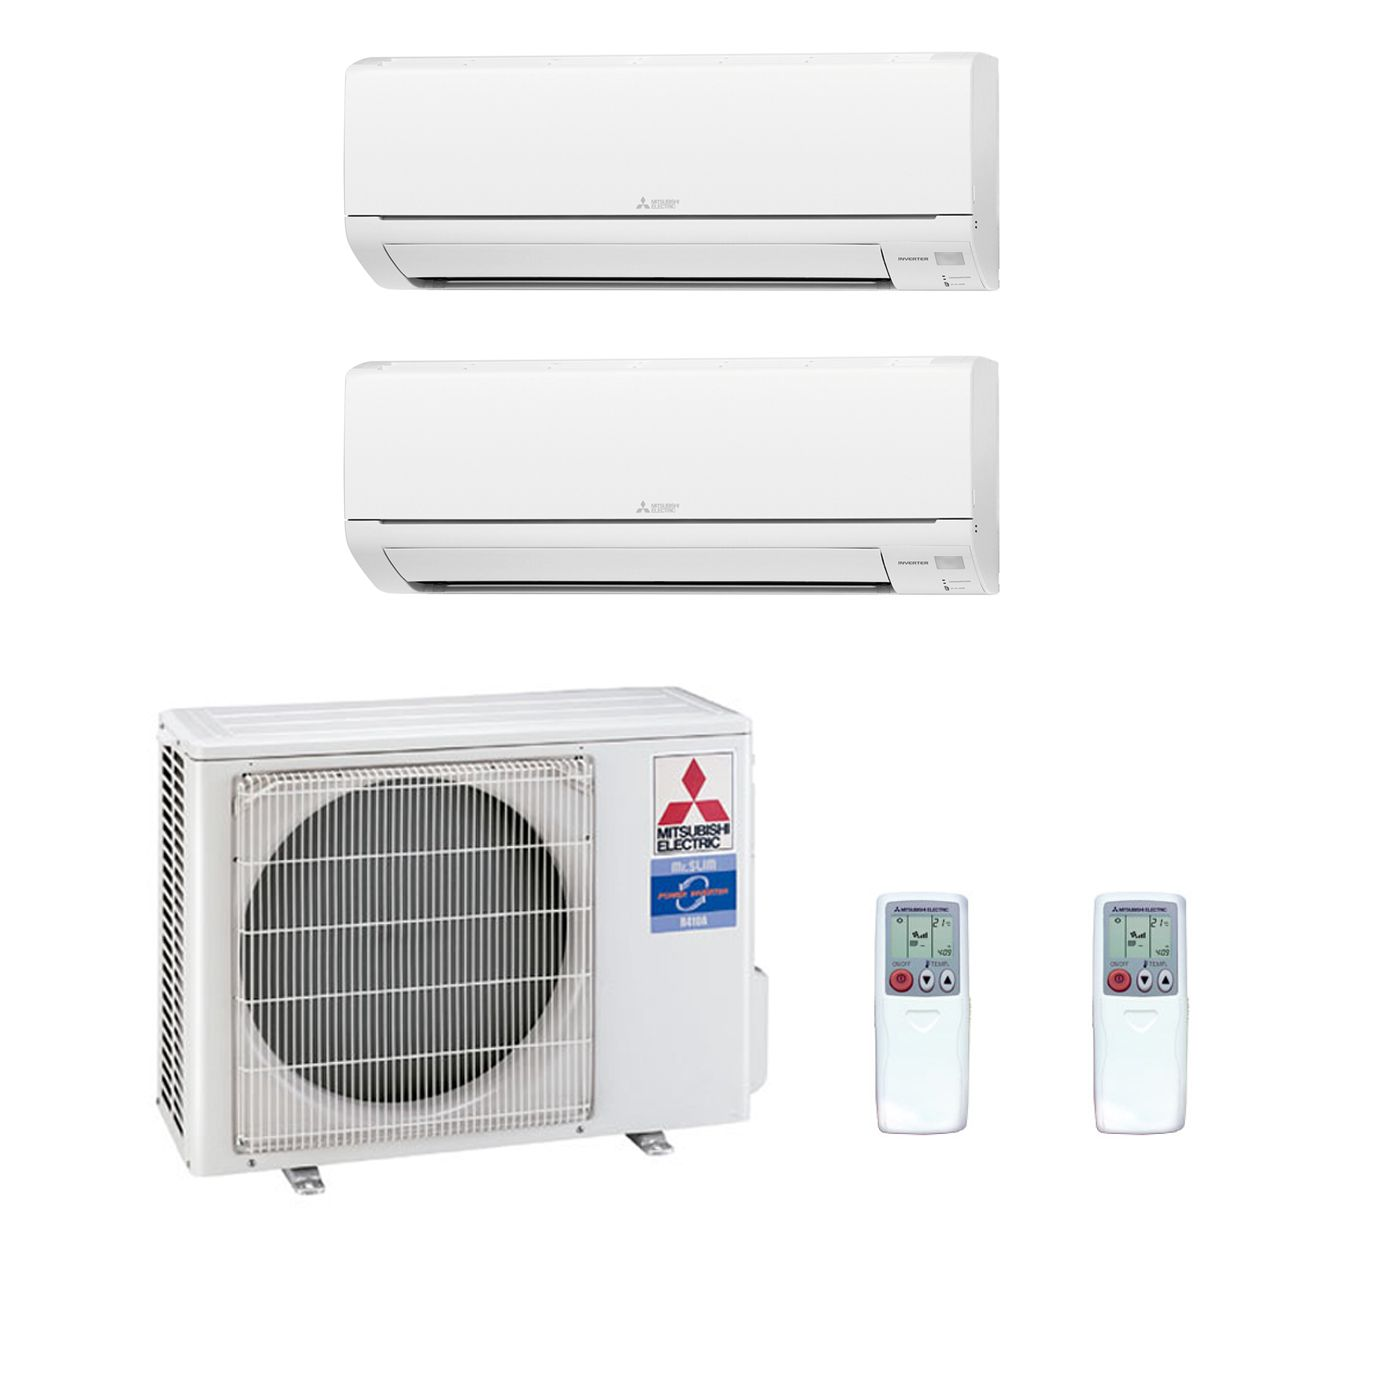 mini constrain mitsubishi wid article penta conditioner en normal mount split btu zone air heat hei ductless hyper fit mxz wall